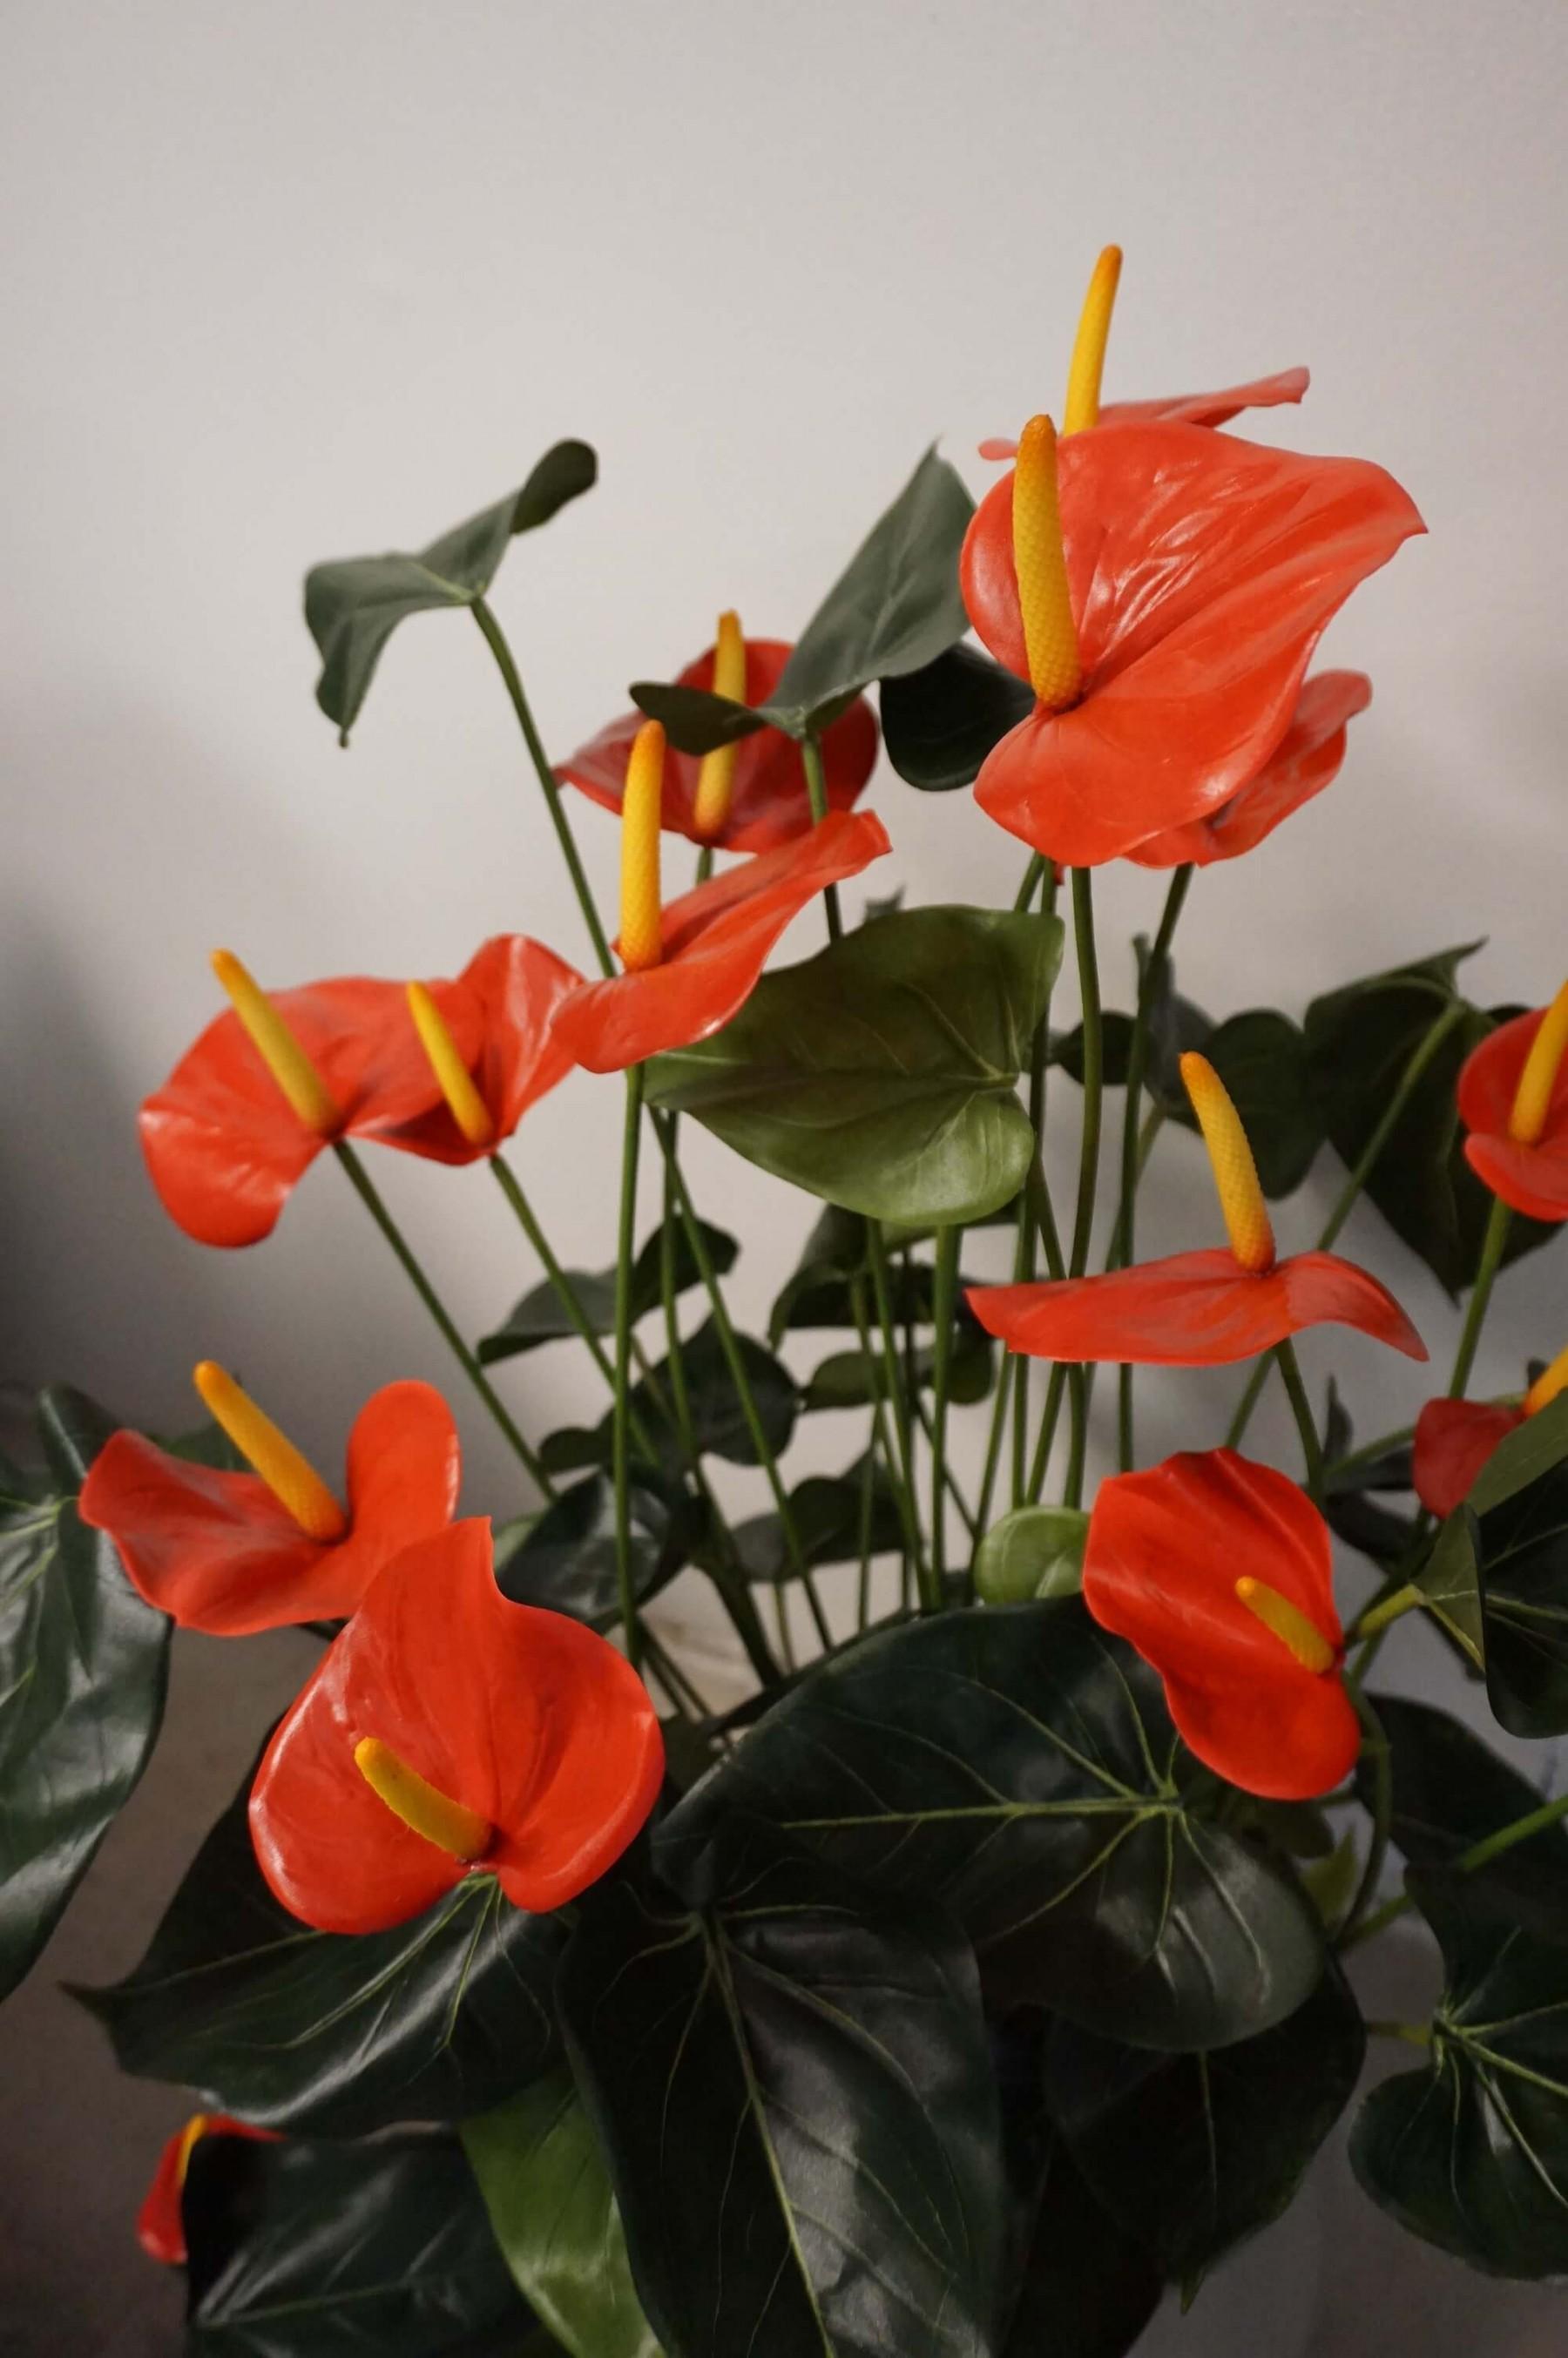 Anthurium, flamingo, röd, konstgjord krukväxt